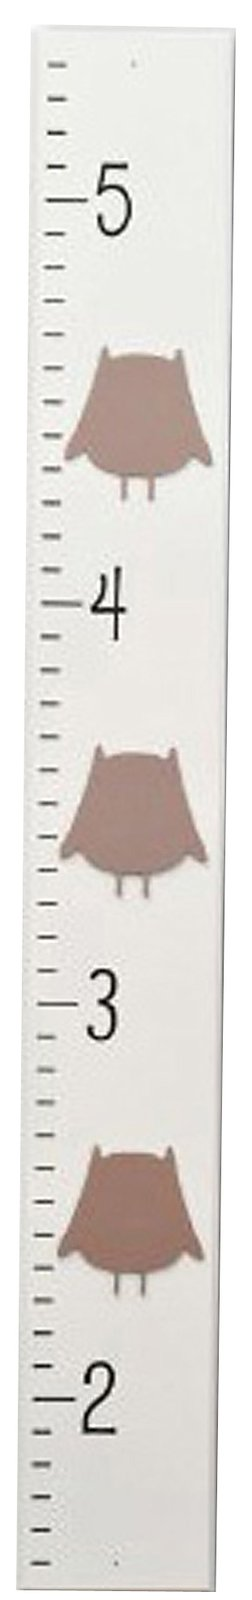 Homeworks Etc Owl Growth Chart   Ivory/Brown   Best Price #DiaperscomNursery